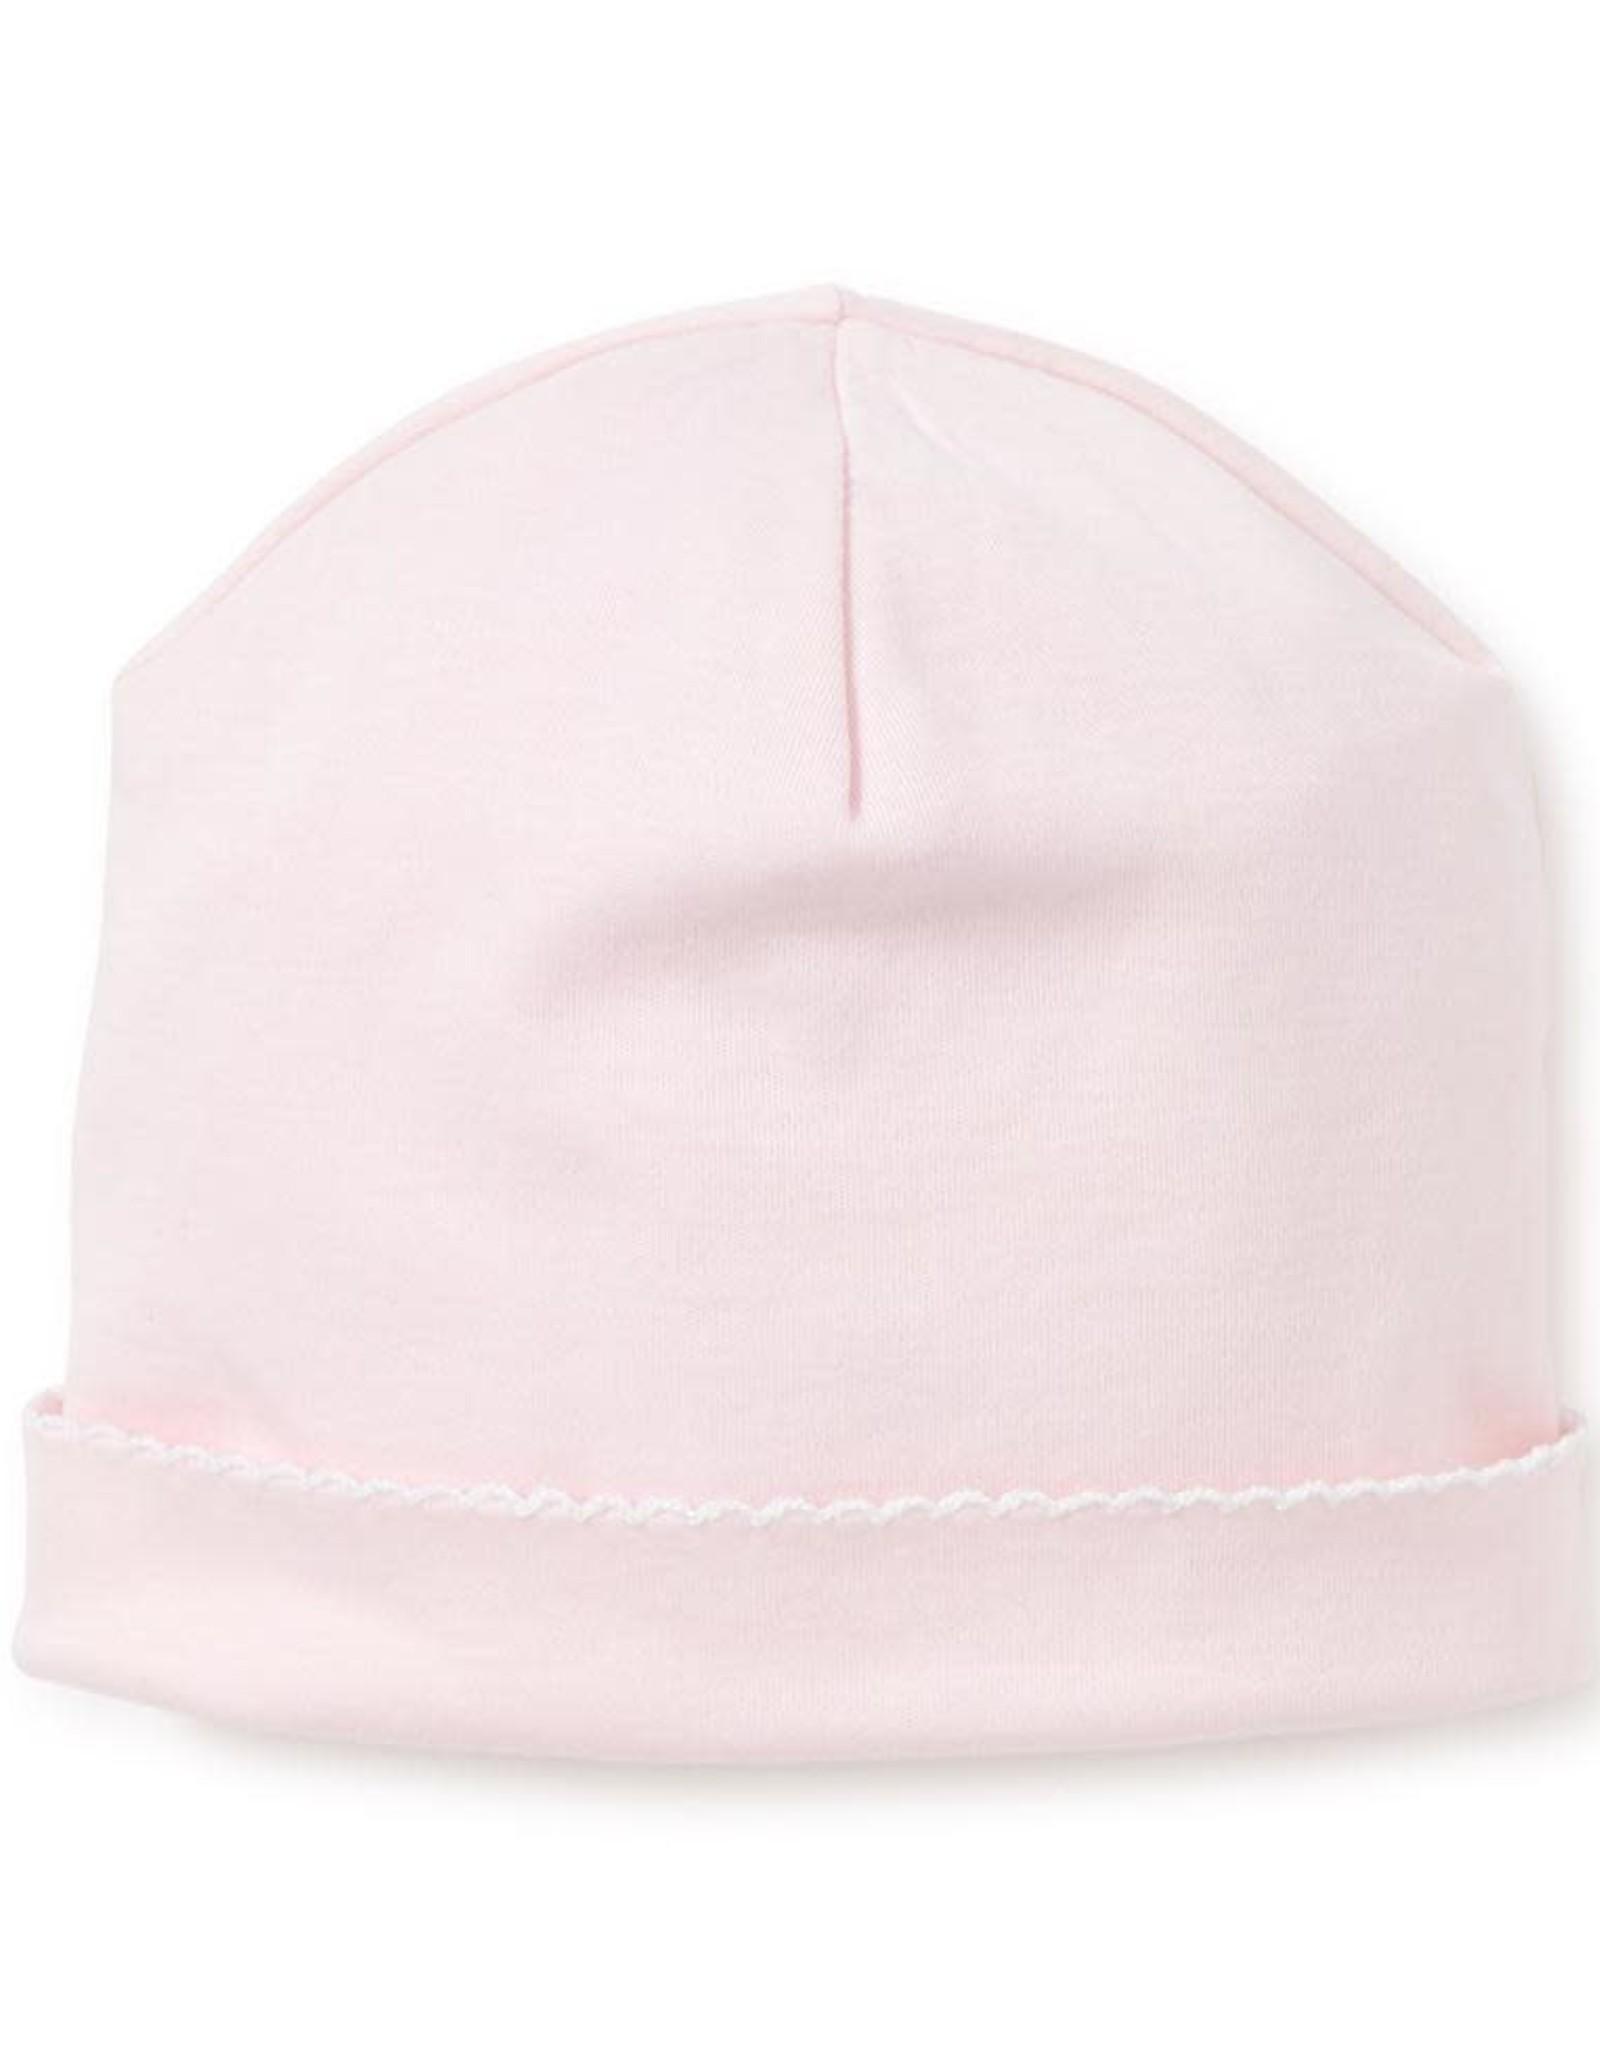 Kissy Kissy Basic Hat Pink/White